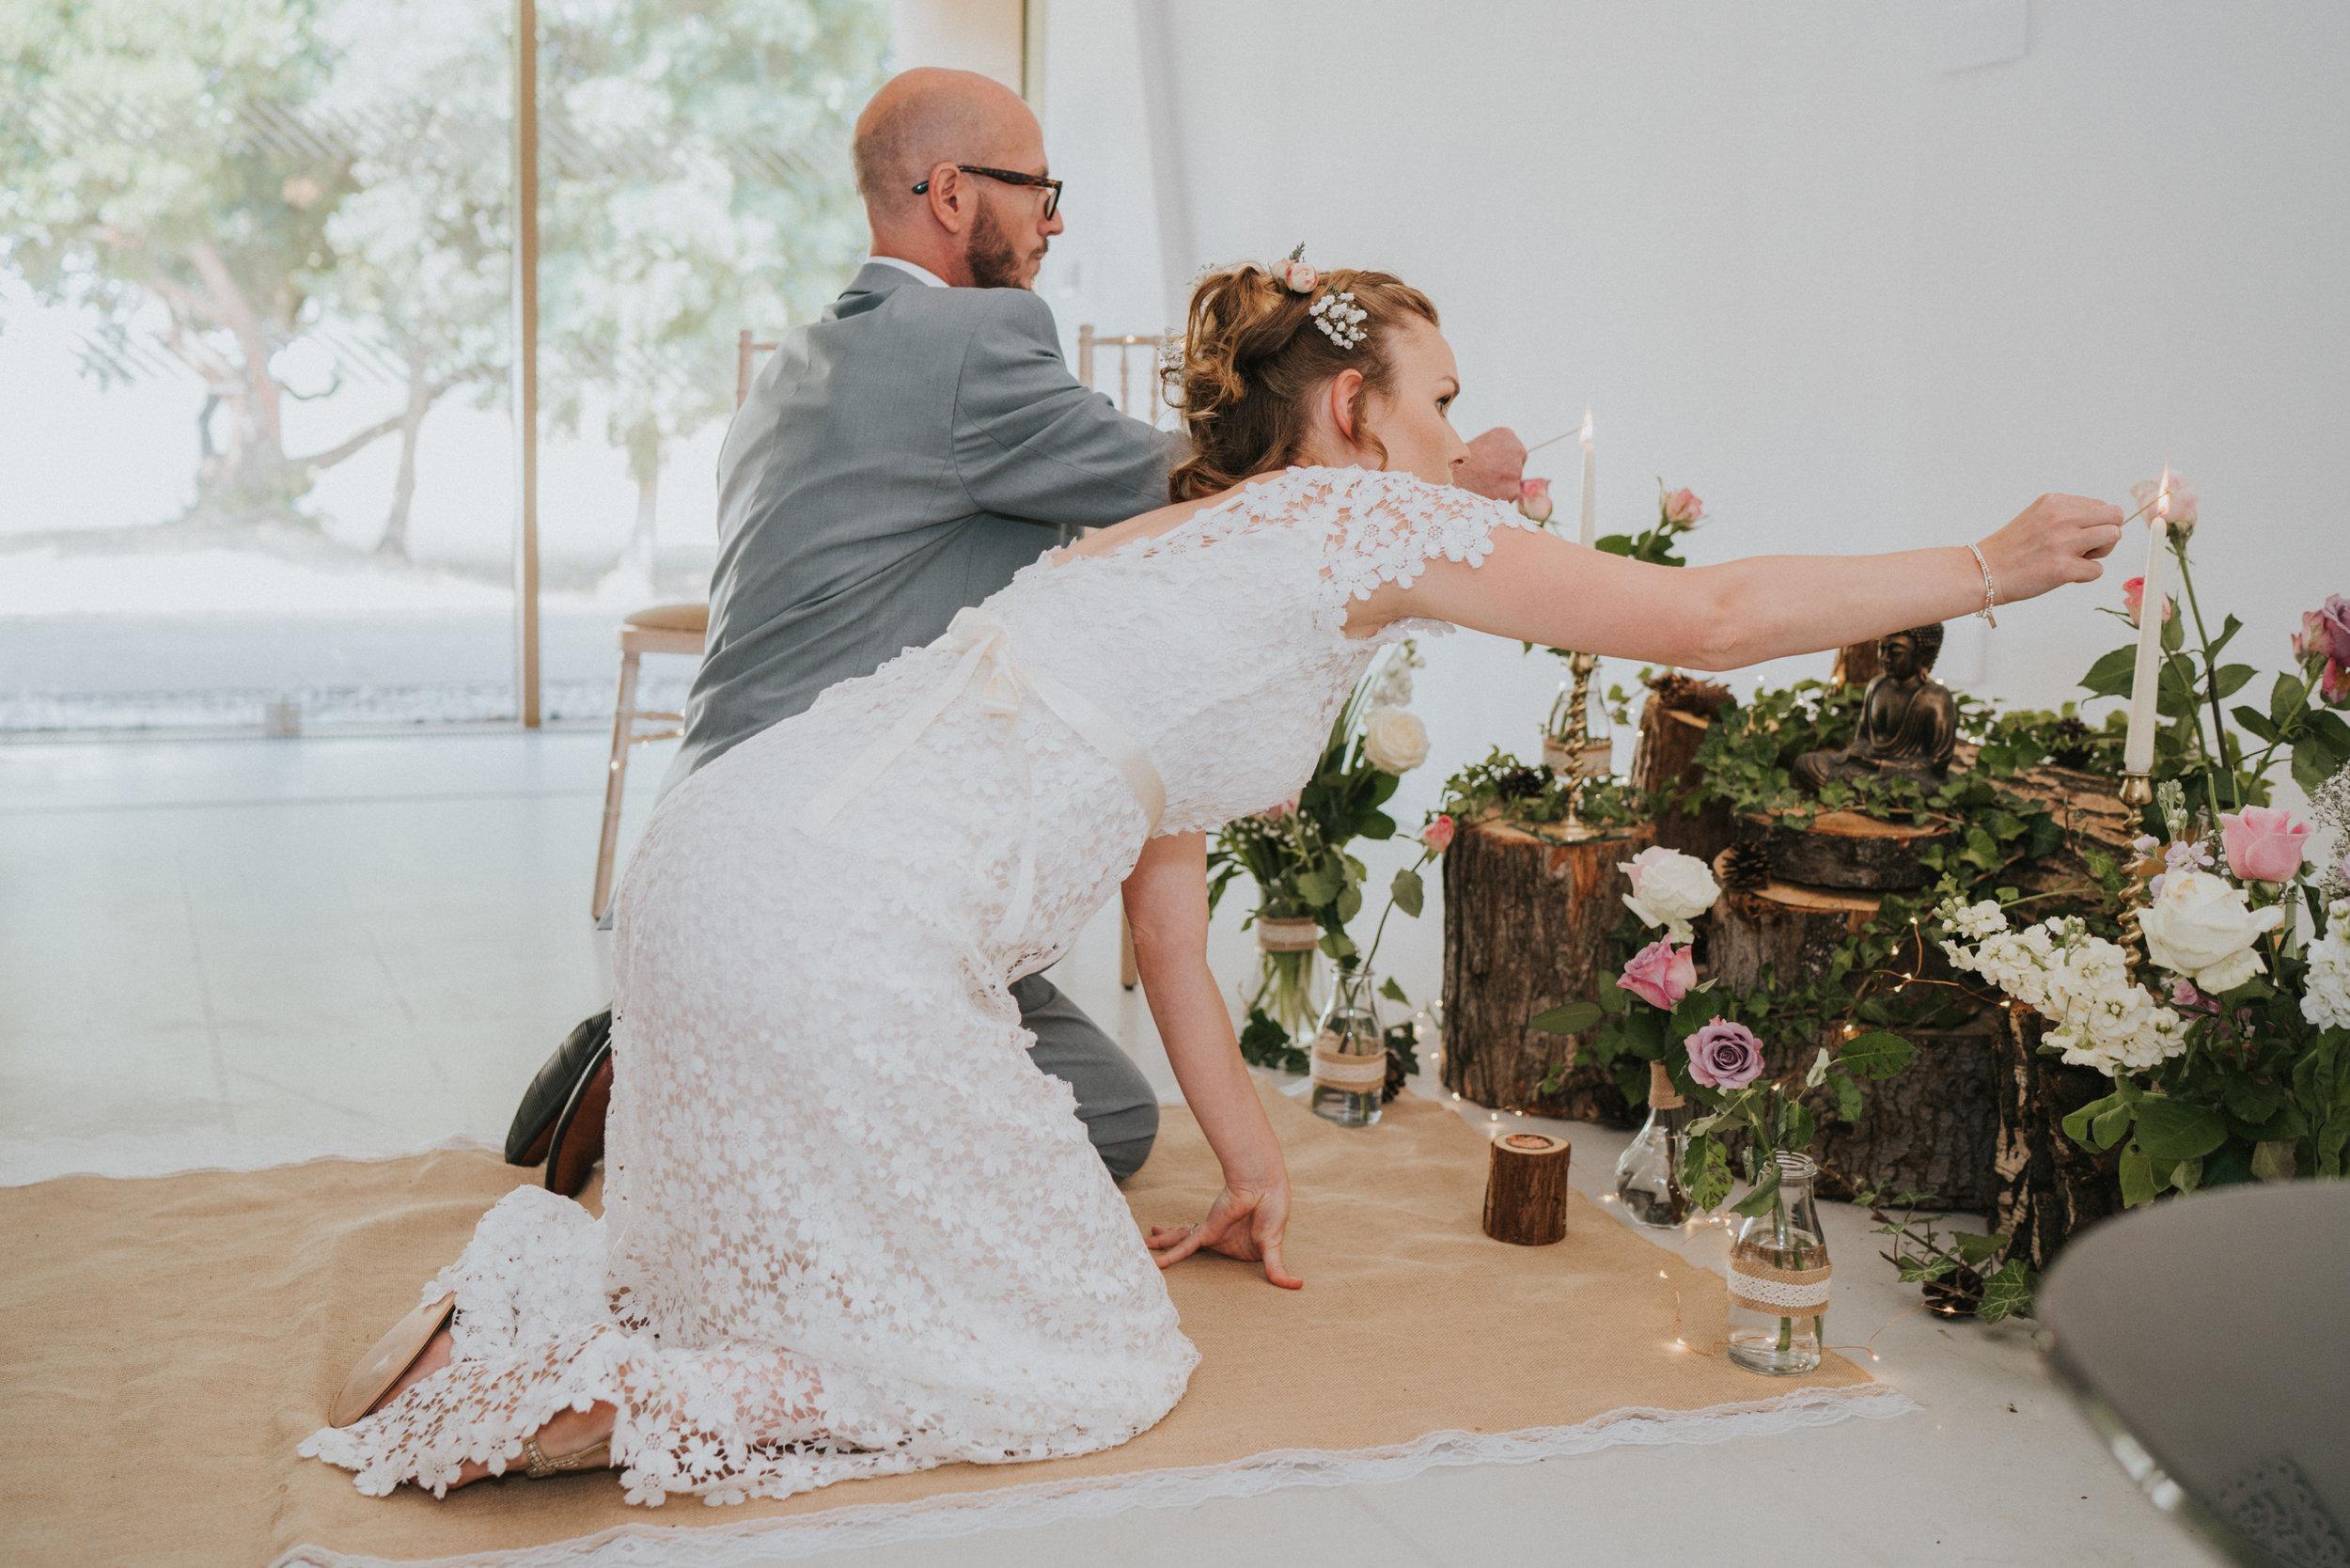 Grace-Elizabeth-Georgie-Amalaketu-Firstsite-Colchester-Essex-Boho-Buddhist-Wedding-Alternative-Wedding-Photography-Essex (52 of 100).jpg